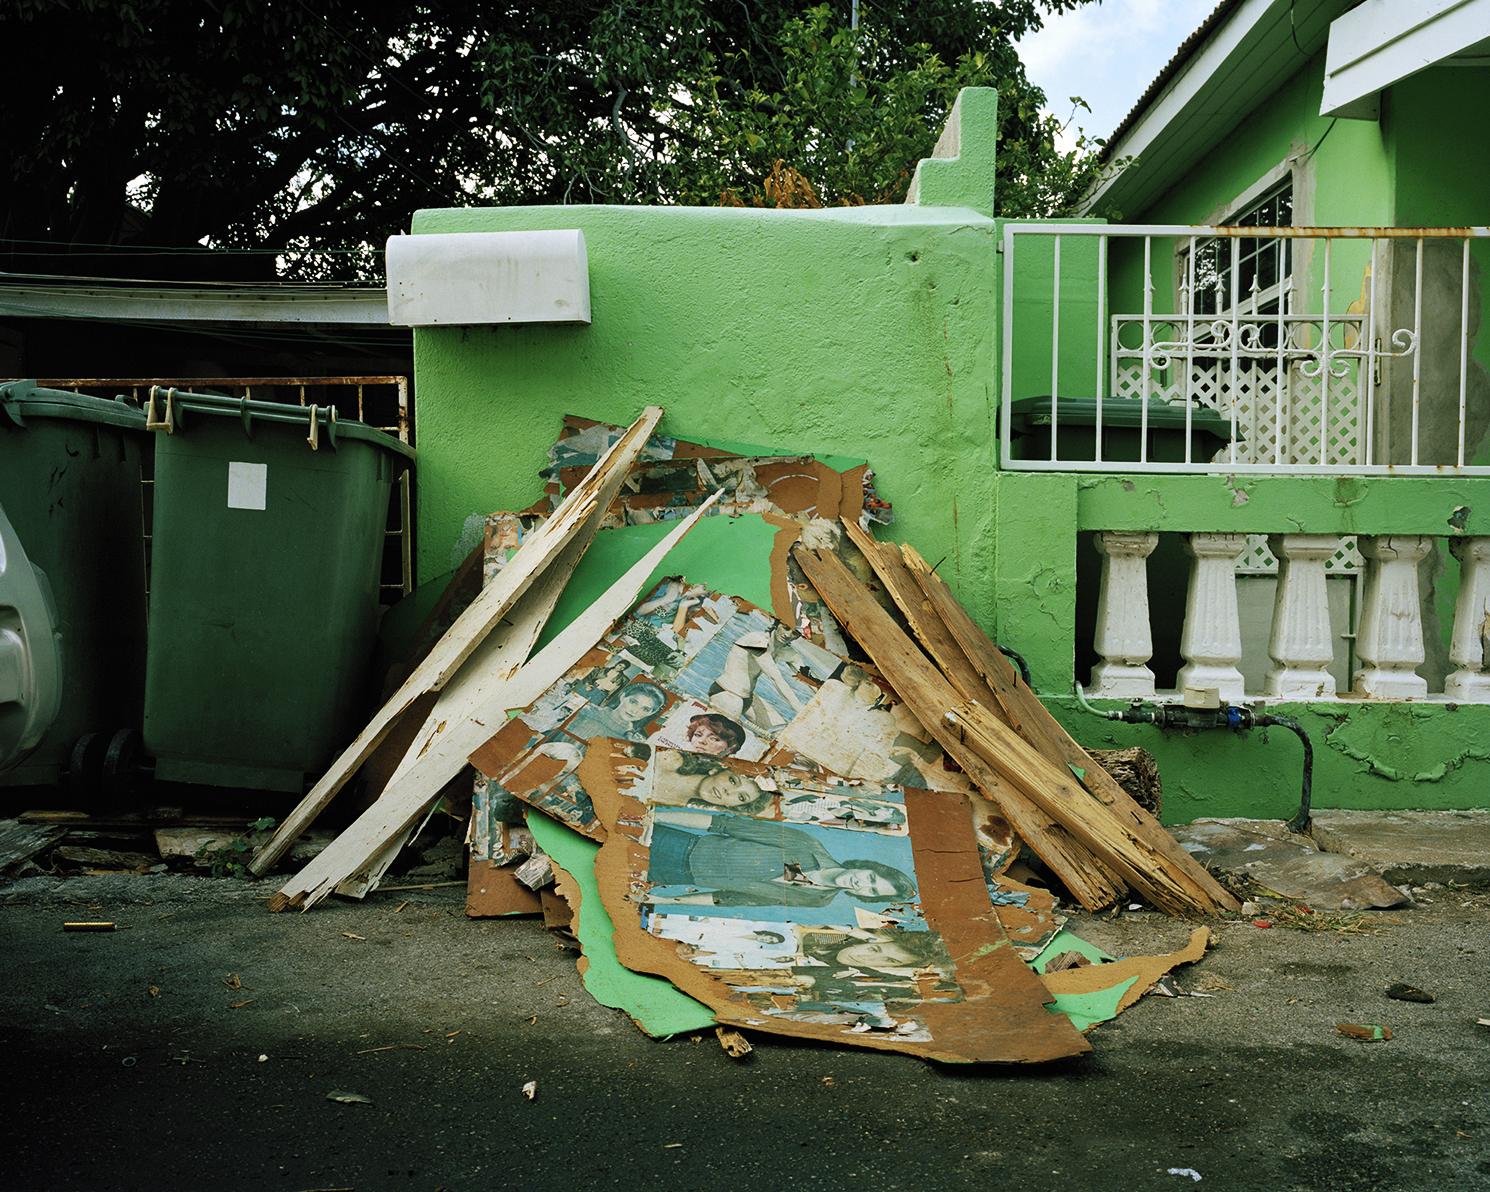 Green_Trash.jpg